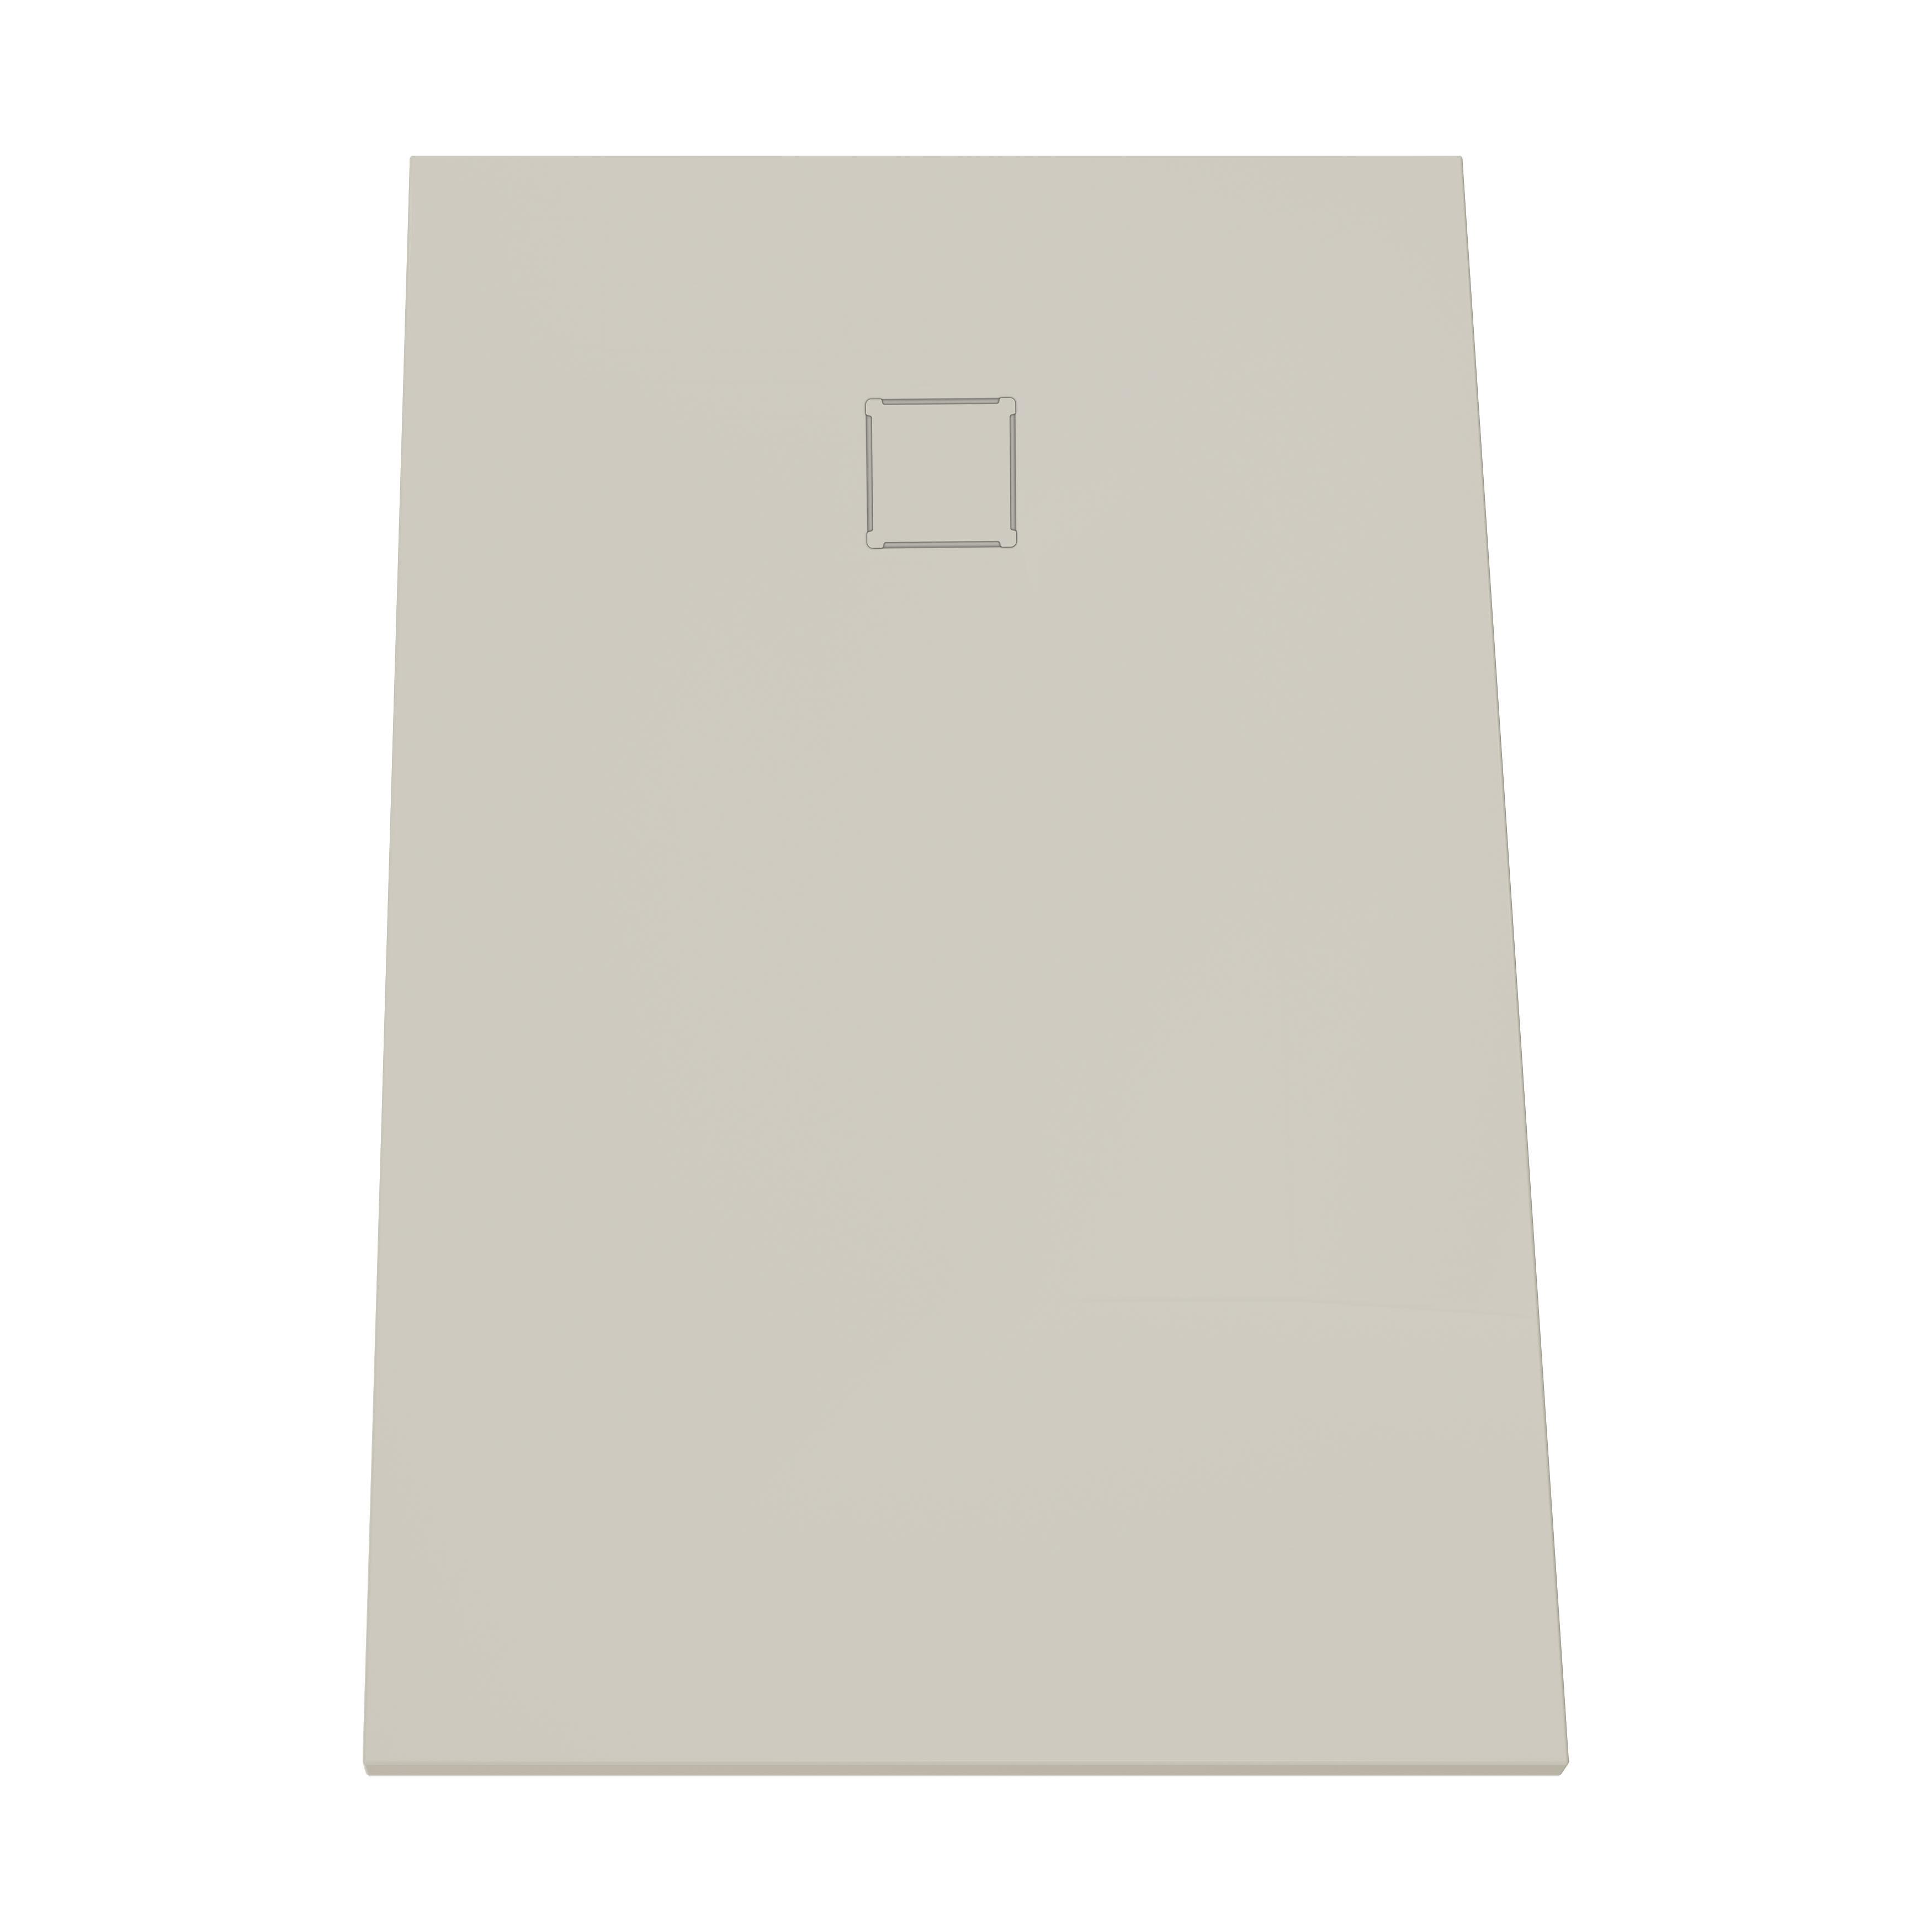 V-stone, receveur ultra plat en solid stone, 160  x  90 cm, taupe